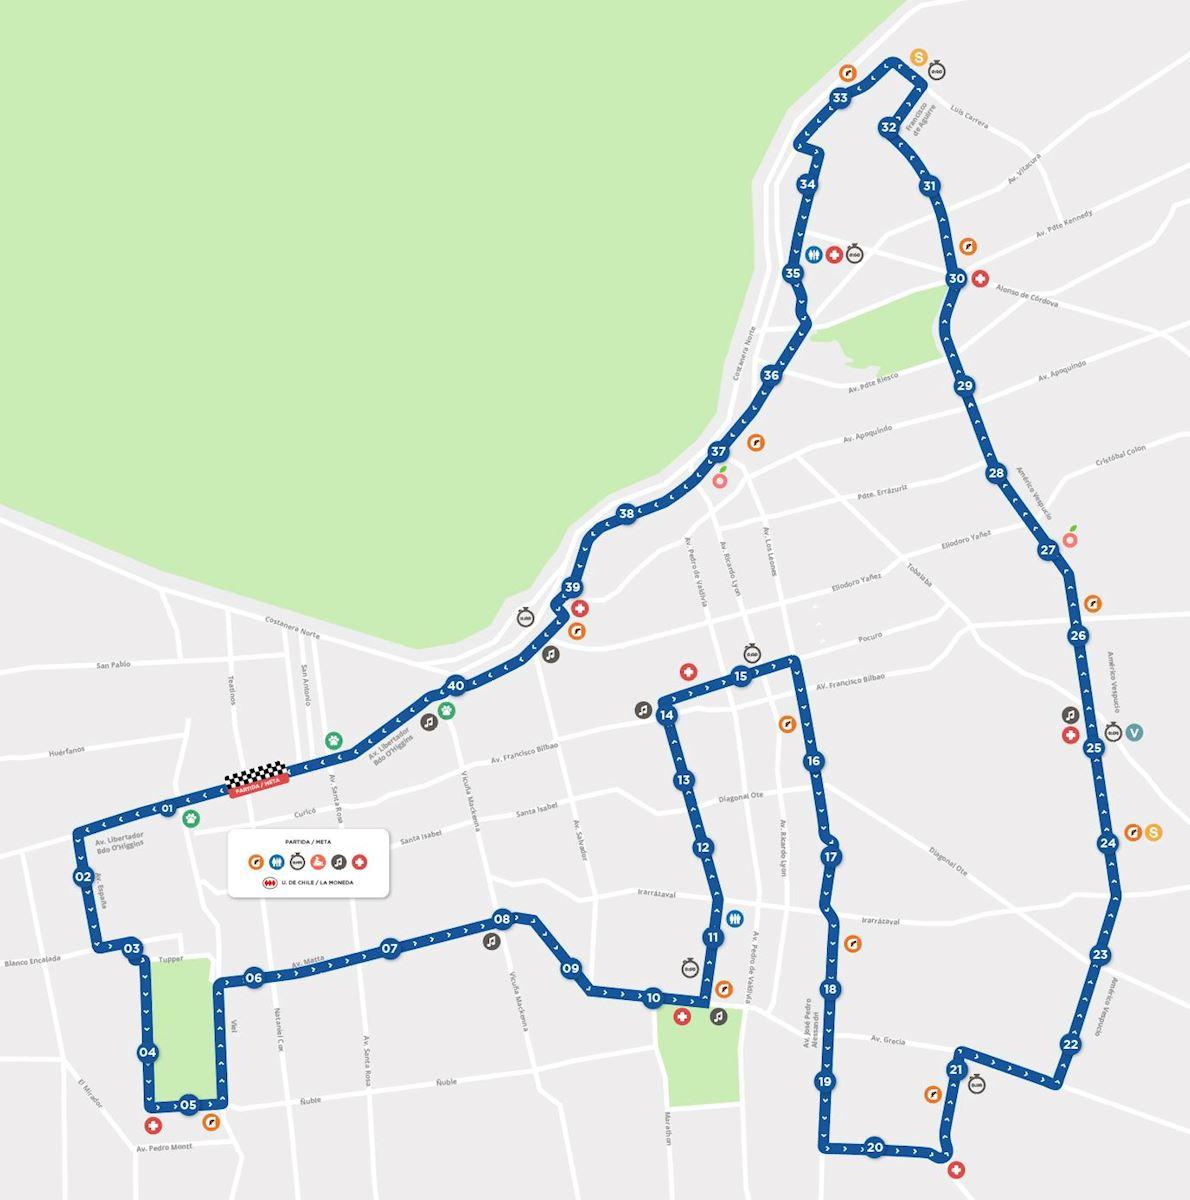 Maraton de santiago Route Map